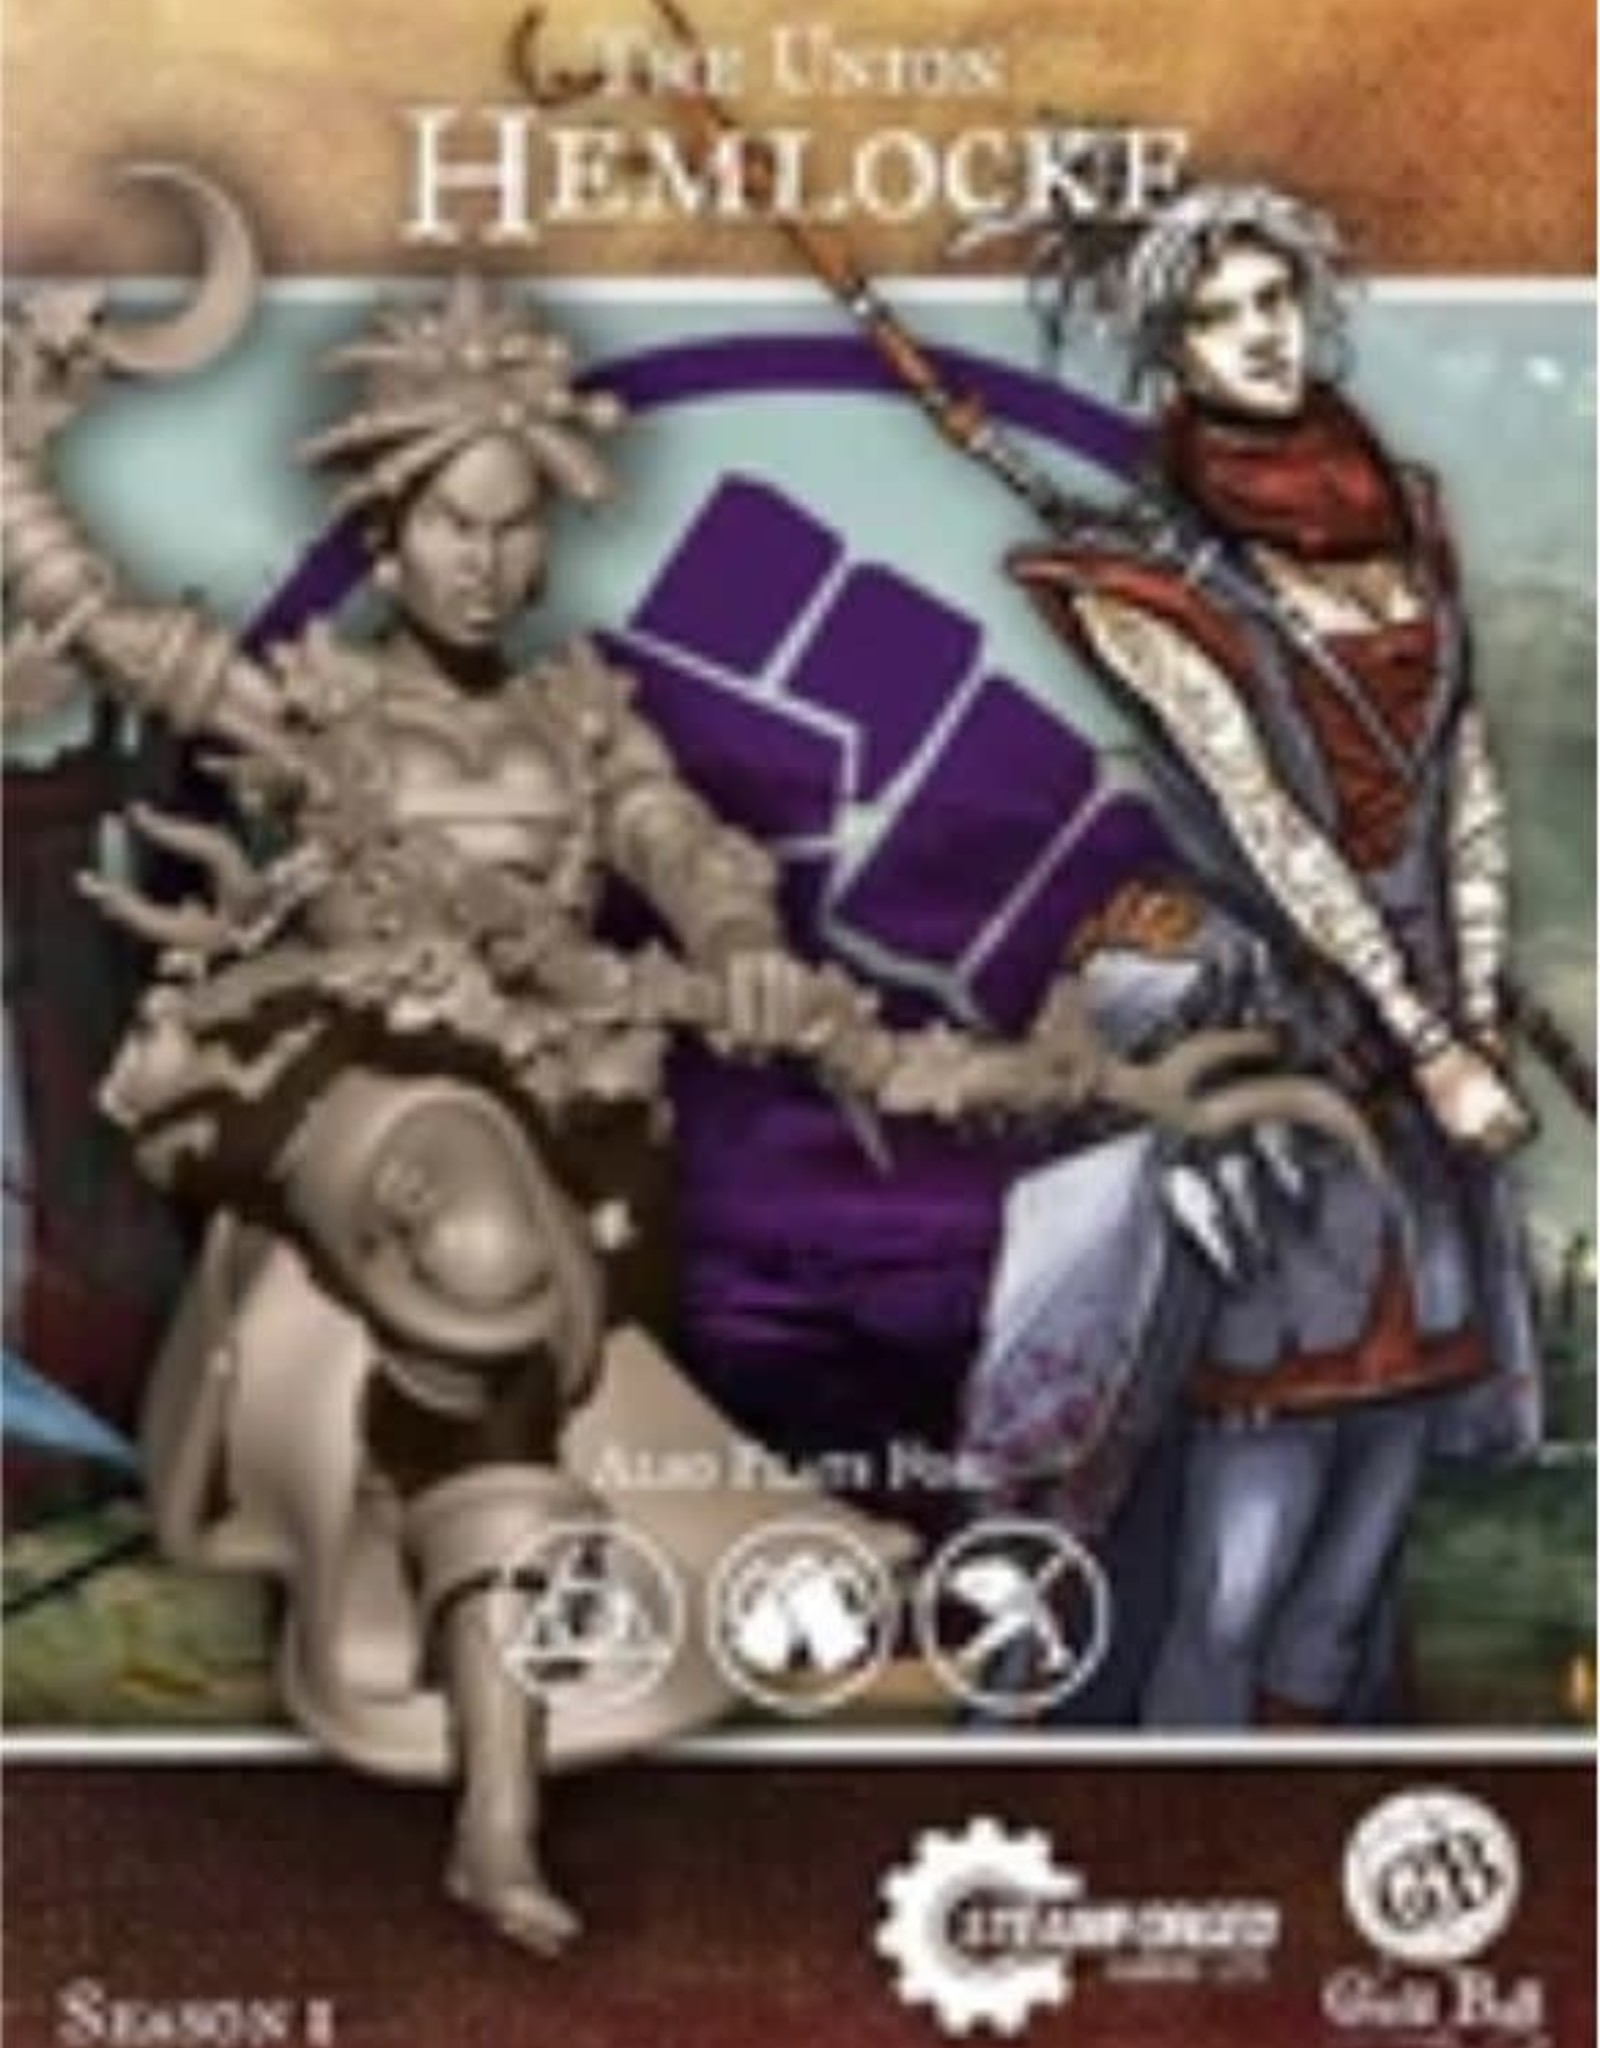 Guild Ball Union: Hemlocke